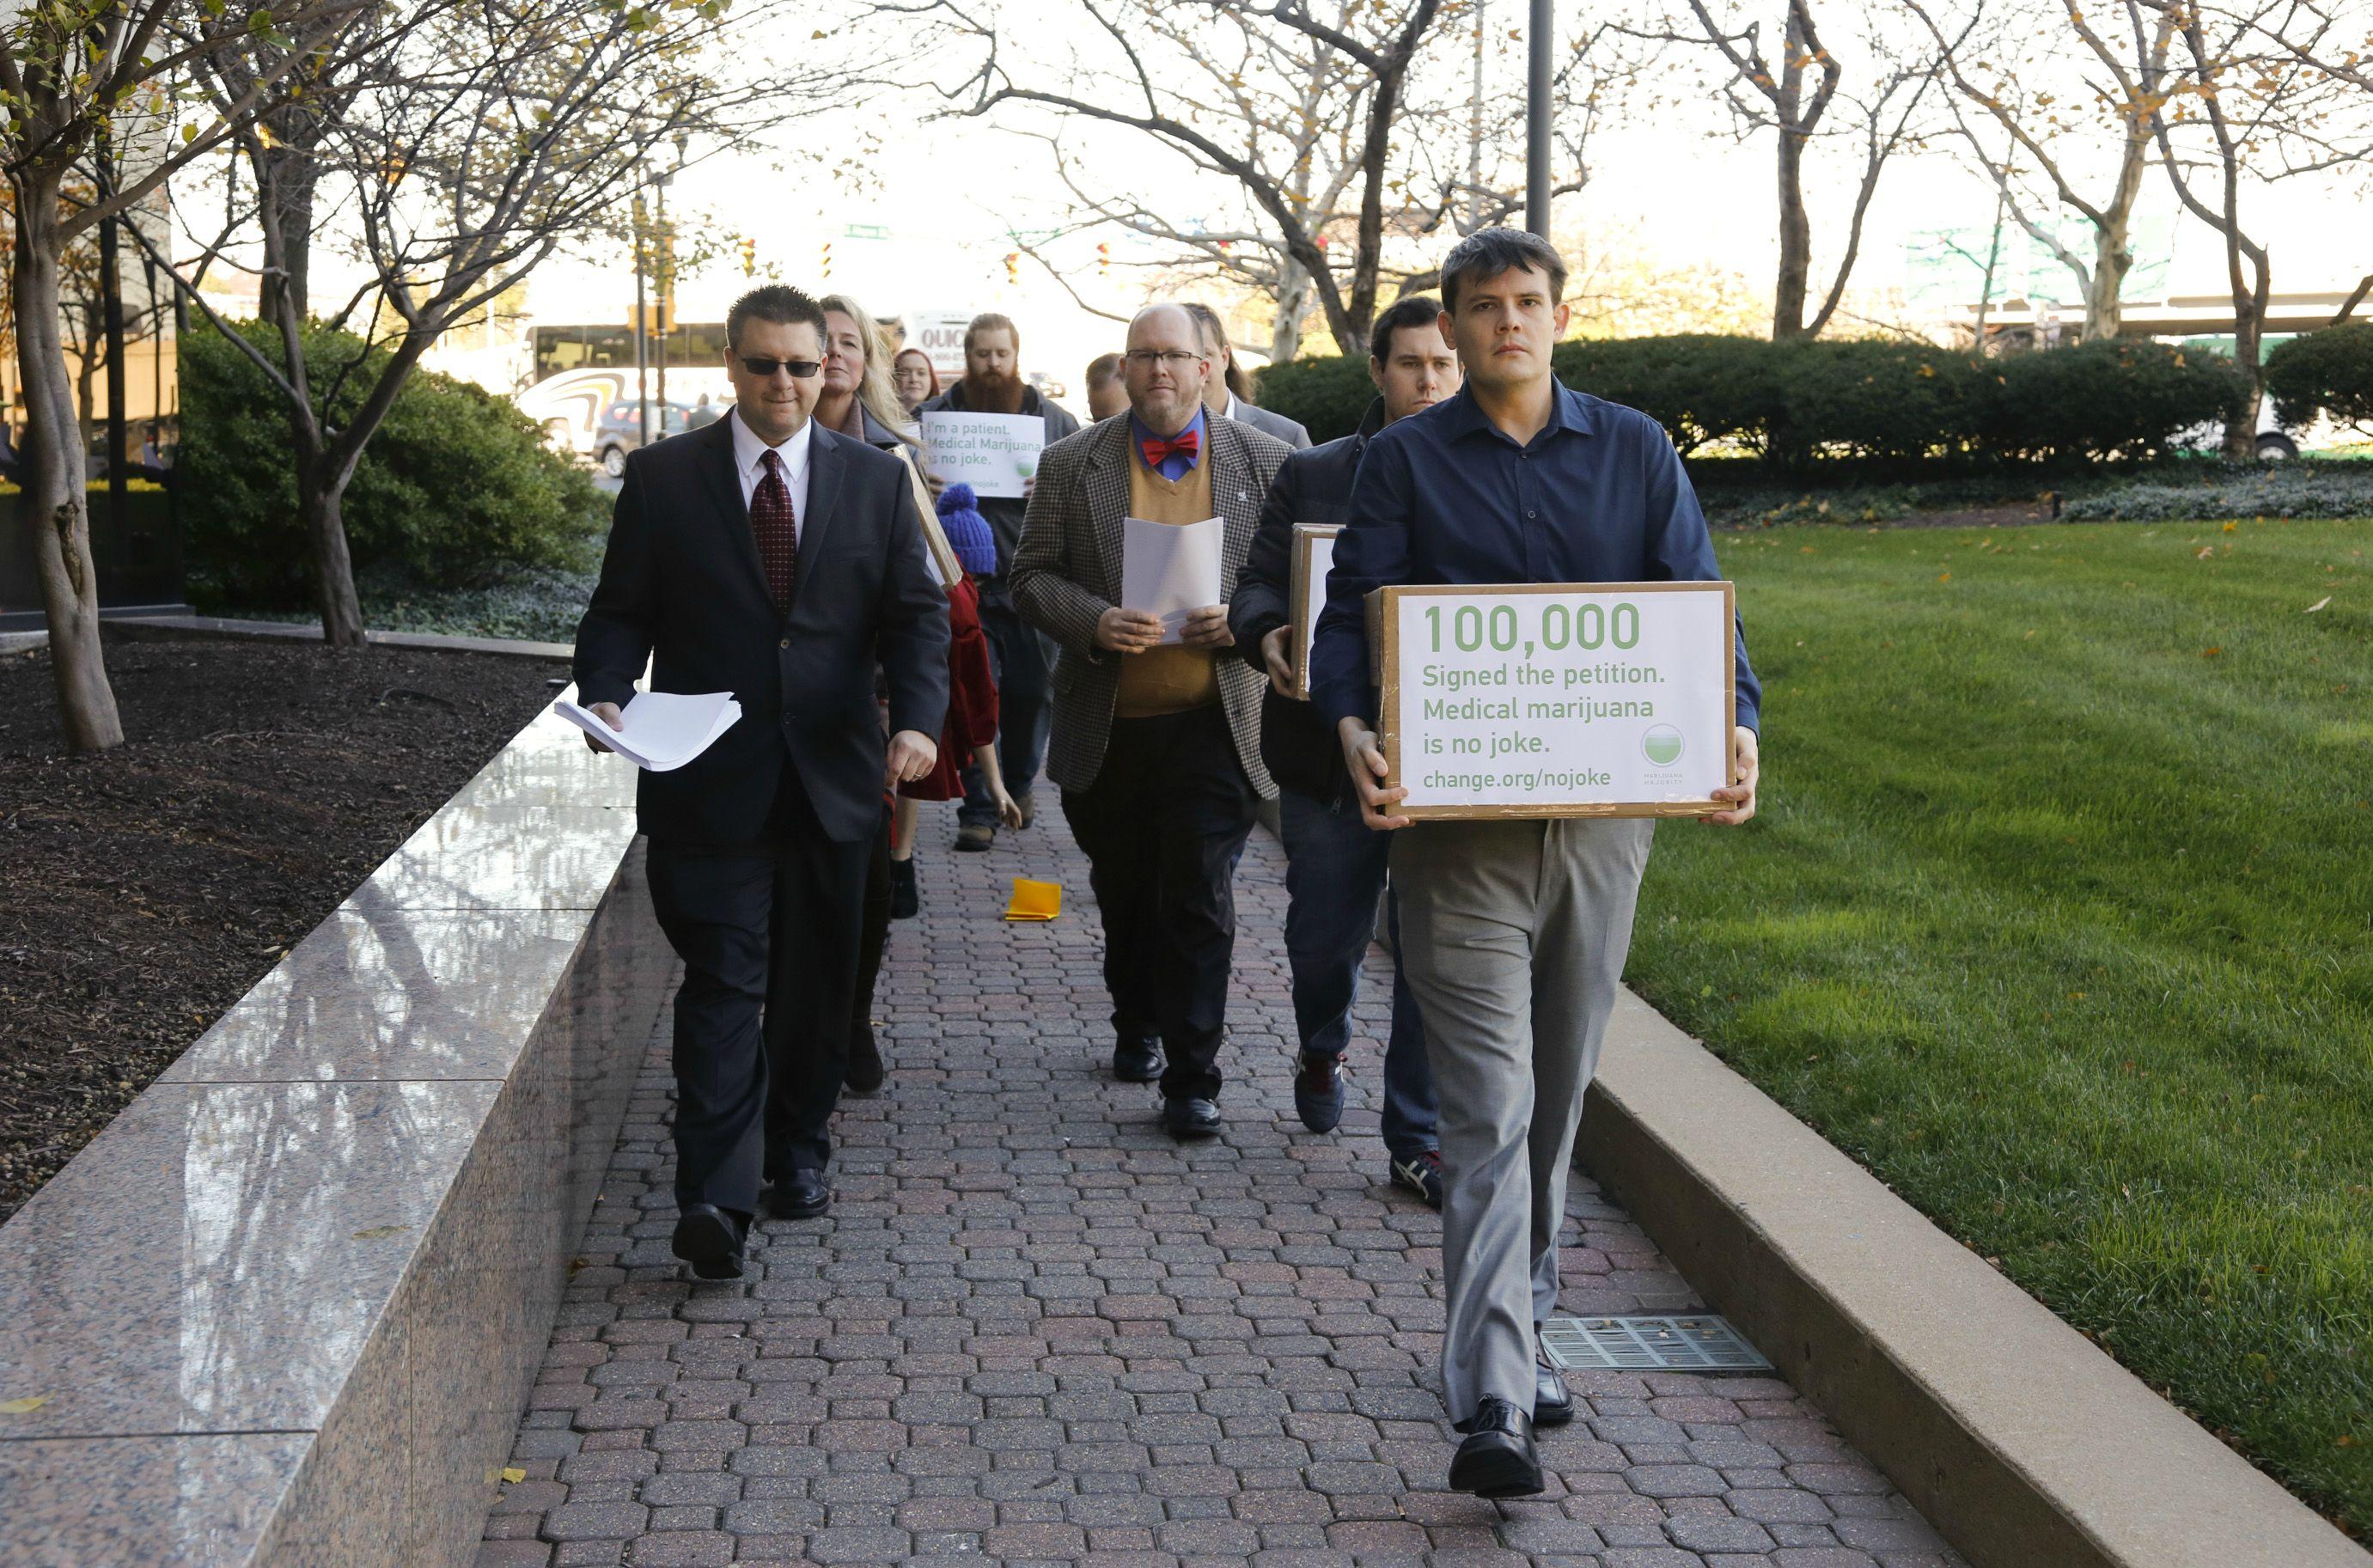 Advocates deliver petition to DEA